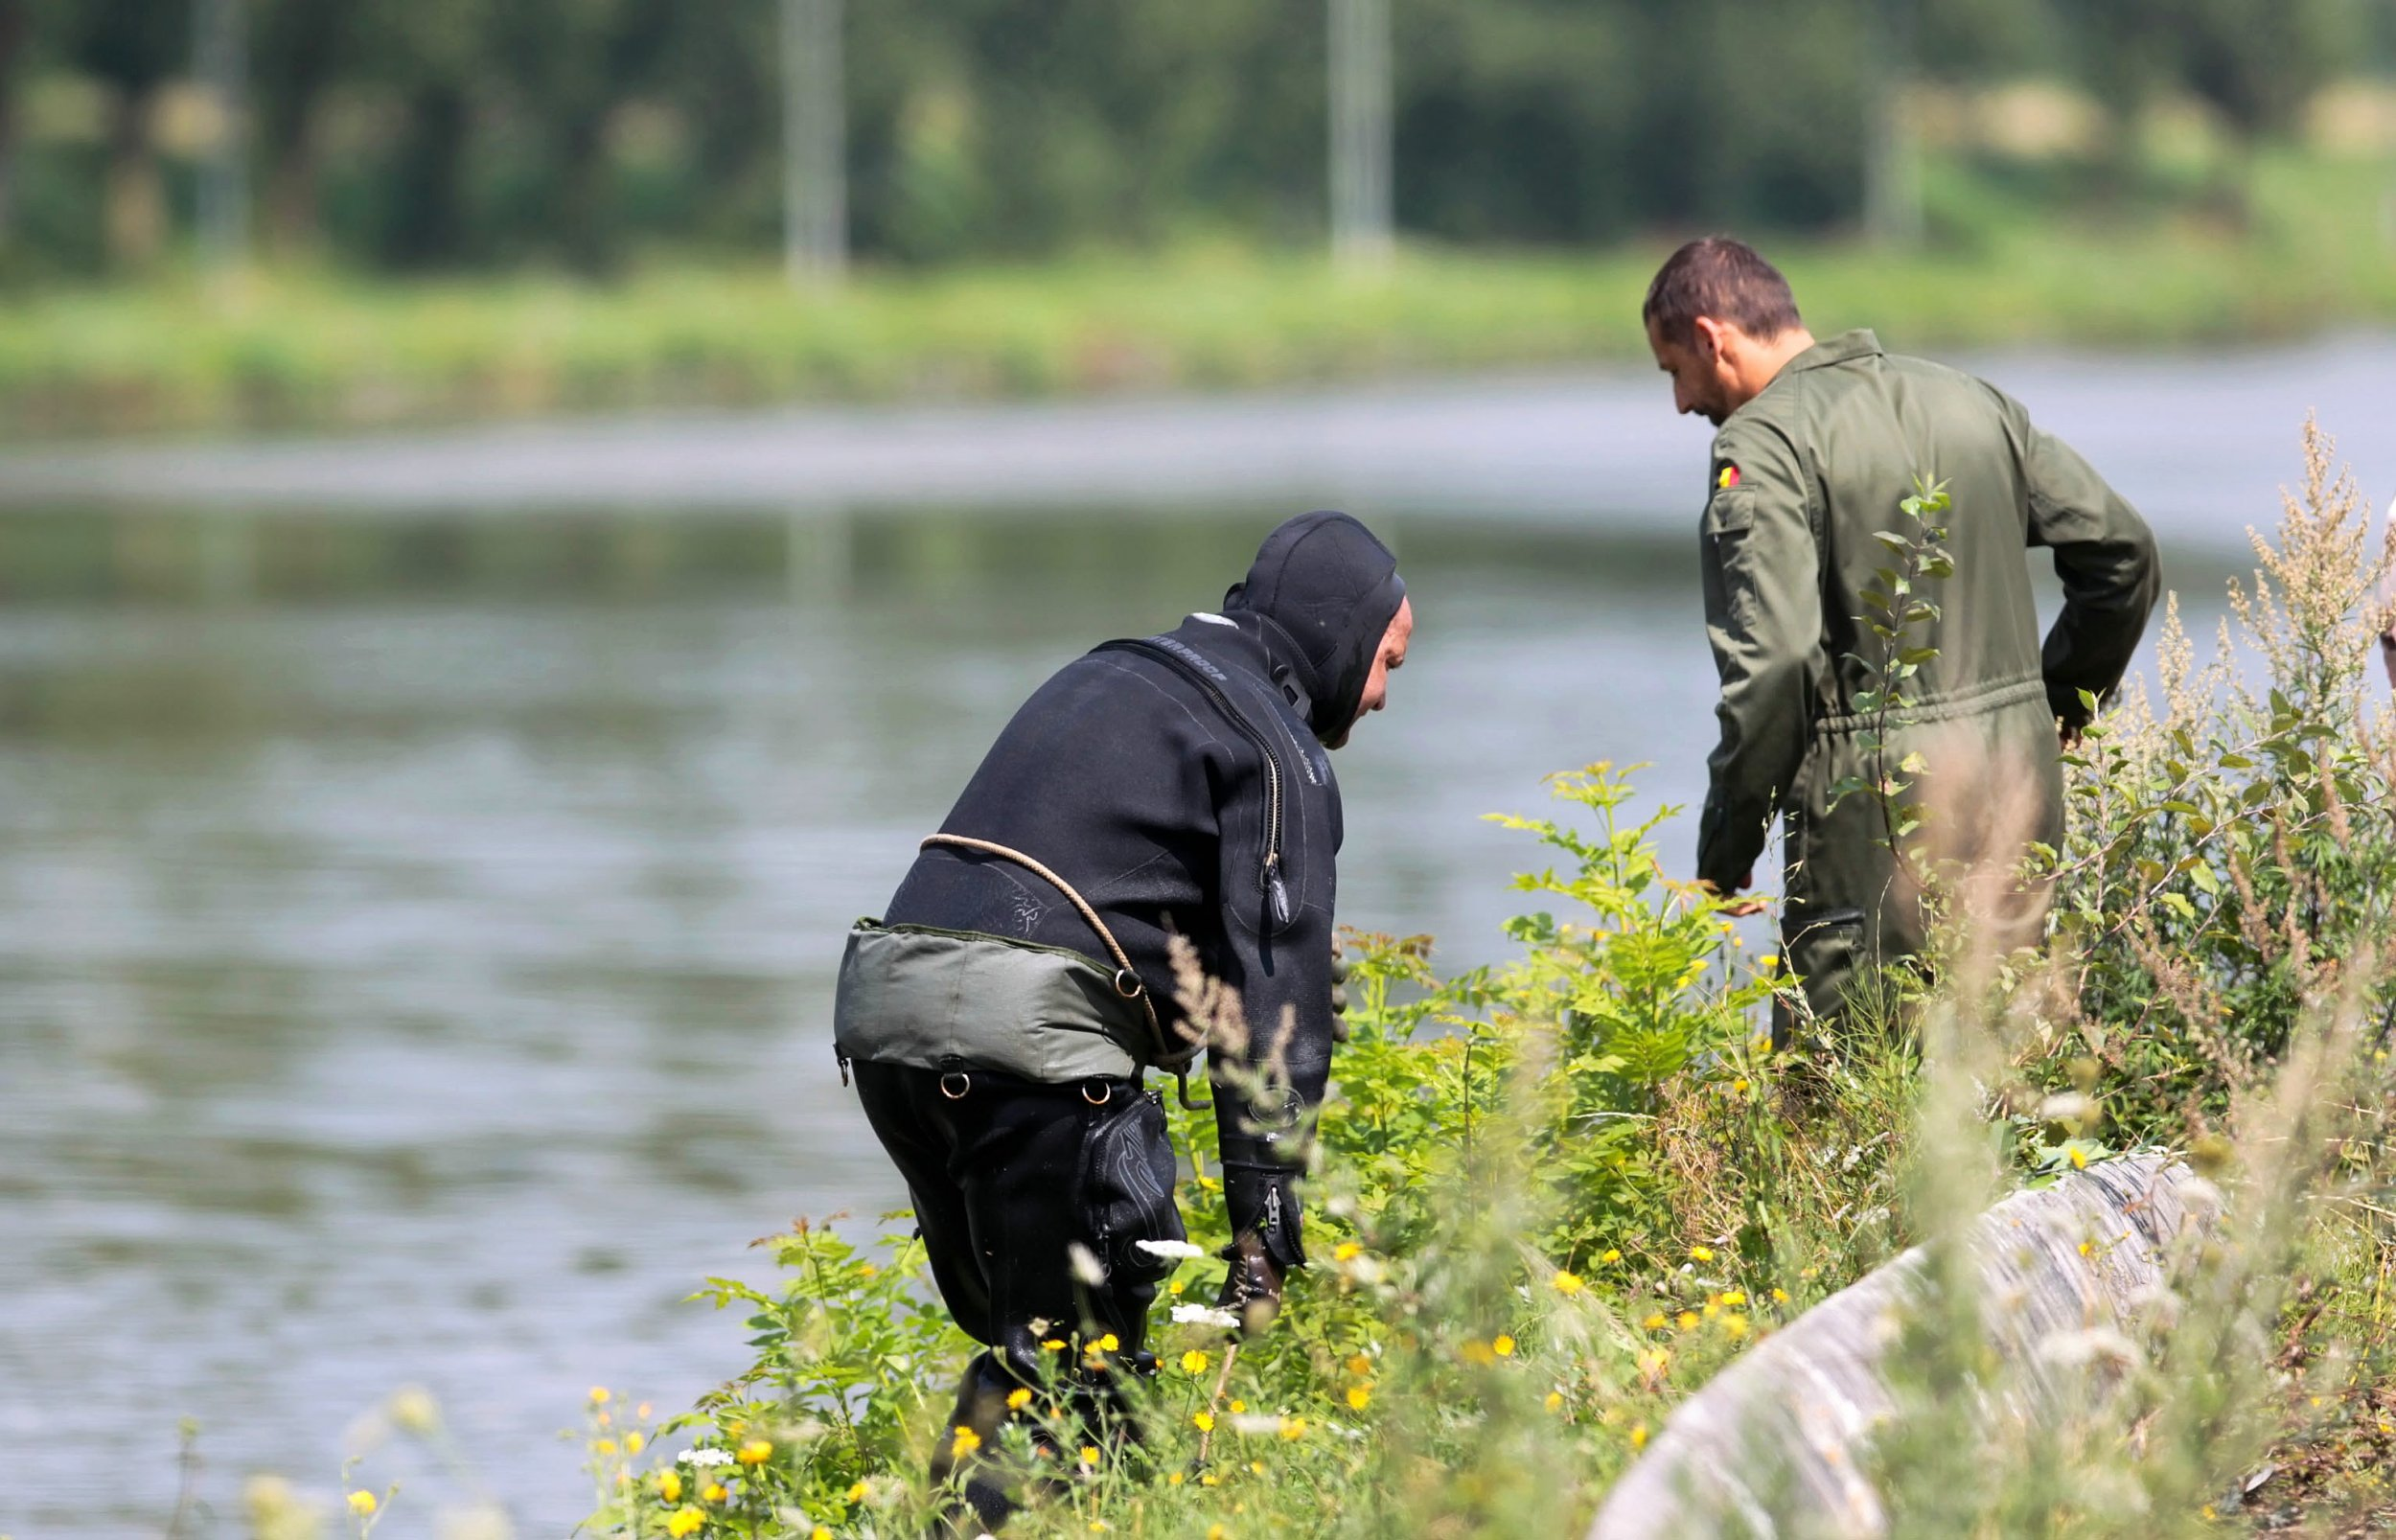 Crazy Brabant Killers Belgium evidence